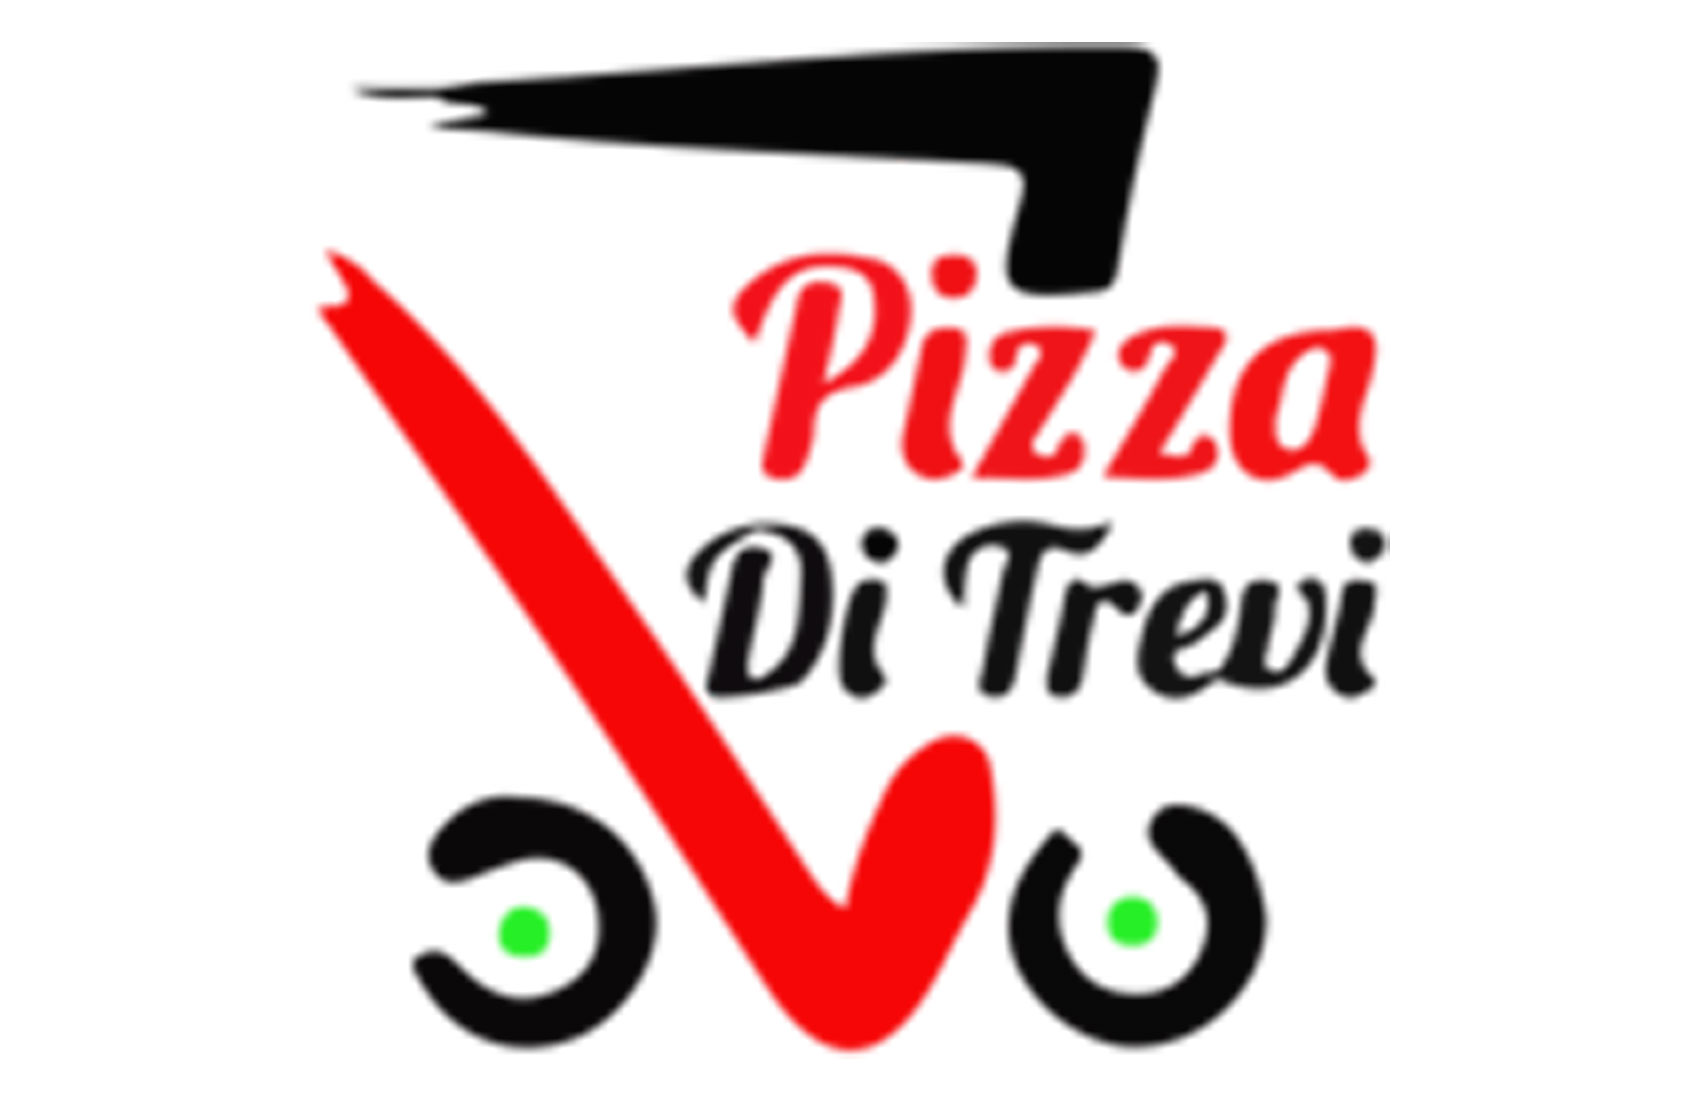 Pizza Di Trevi - Take Away Pizza